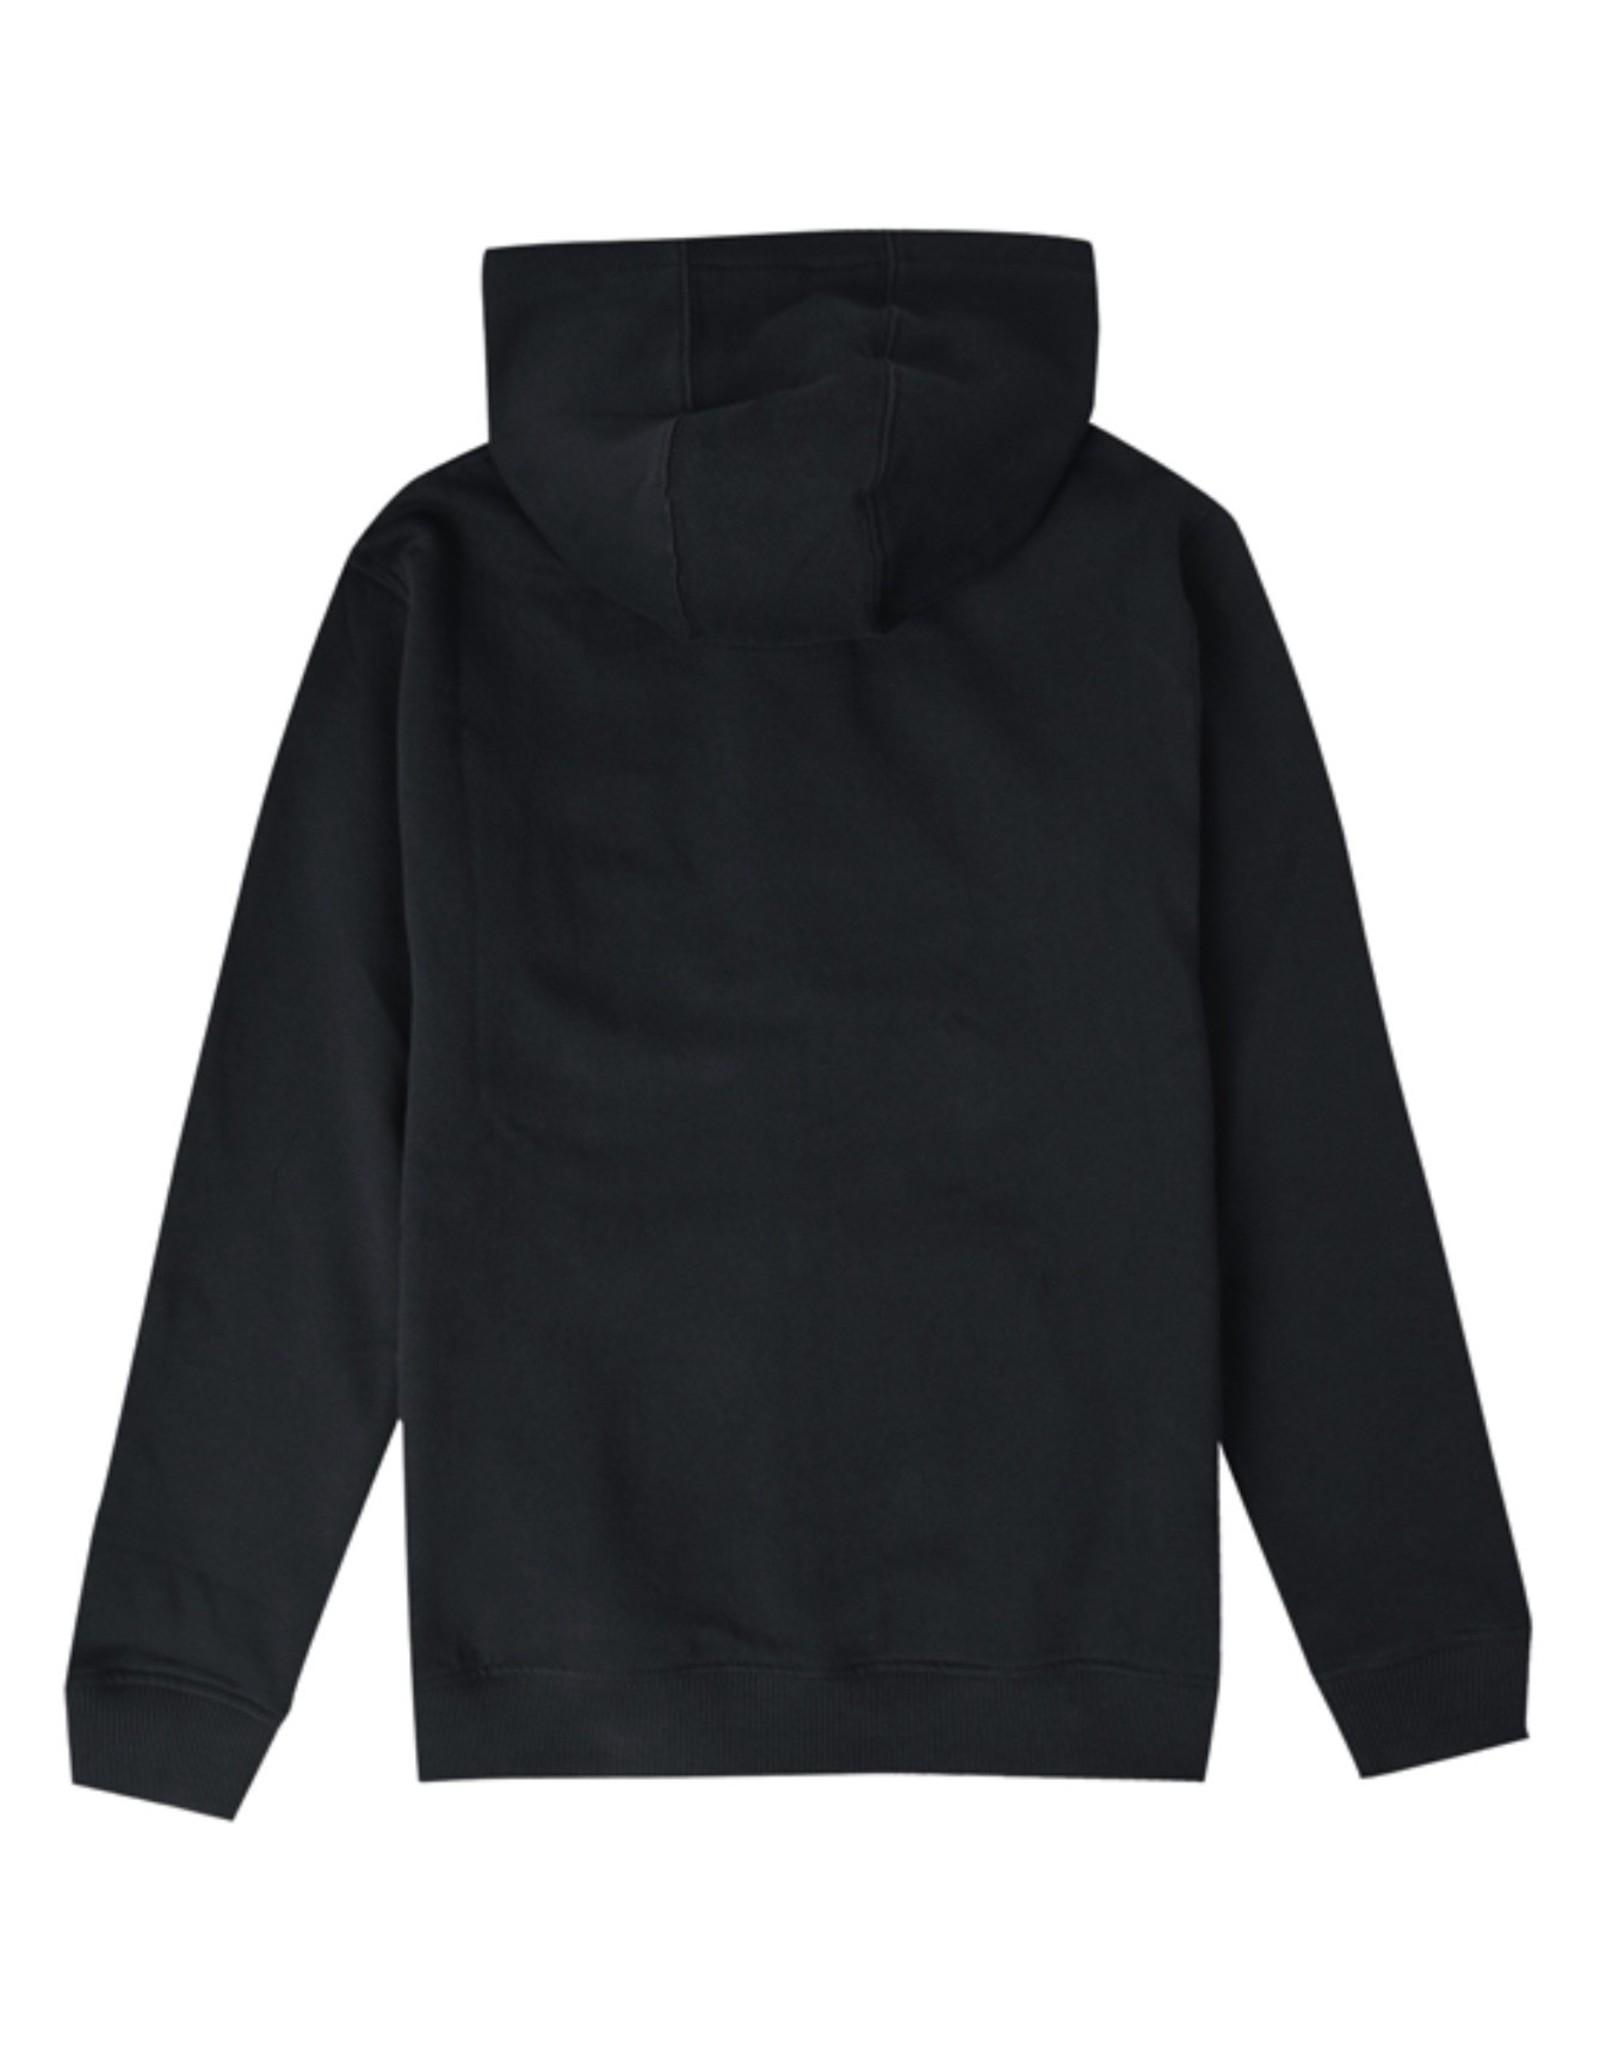 Lyle & Scott LSC0475 sweater maat 164